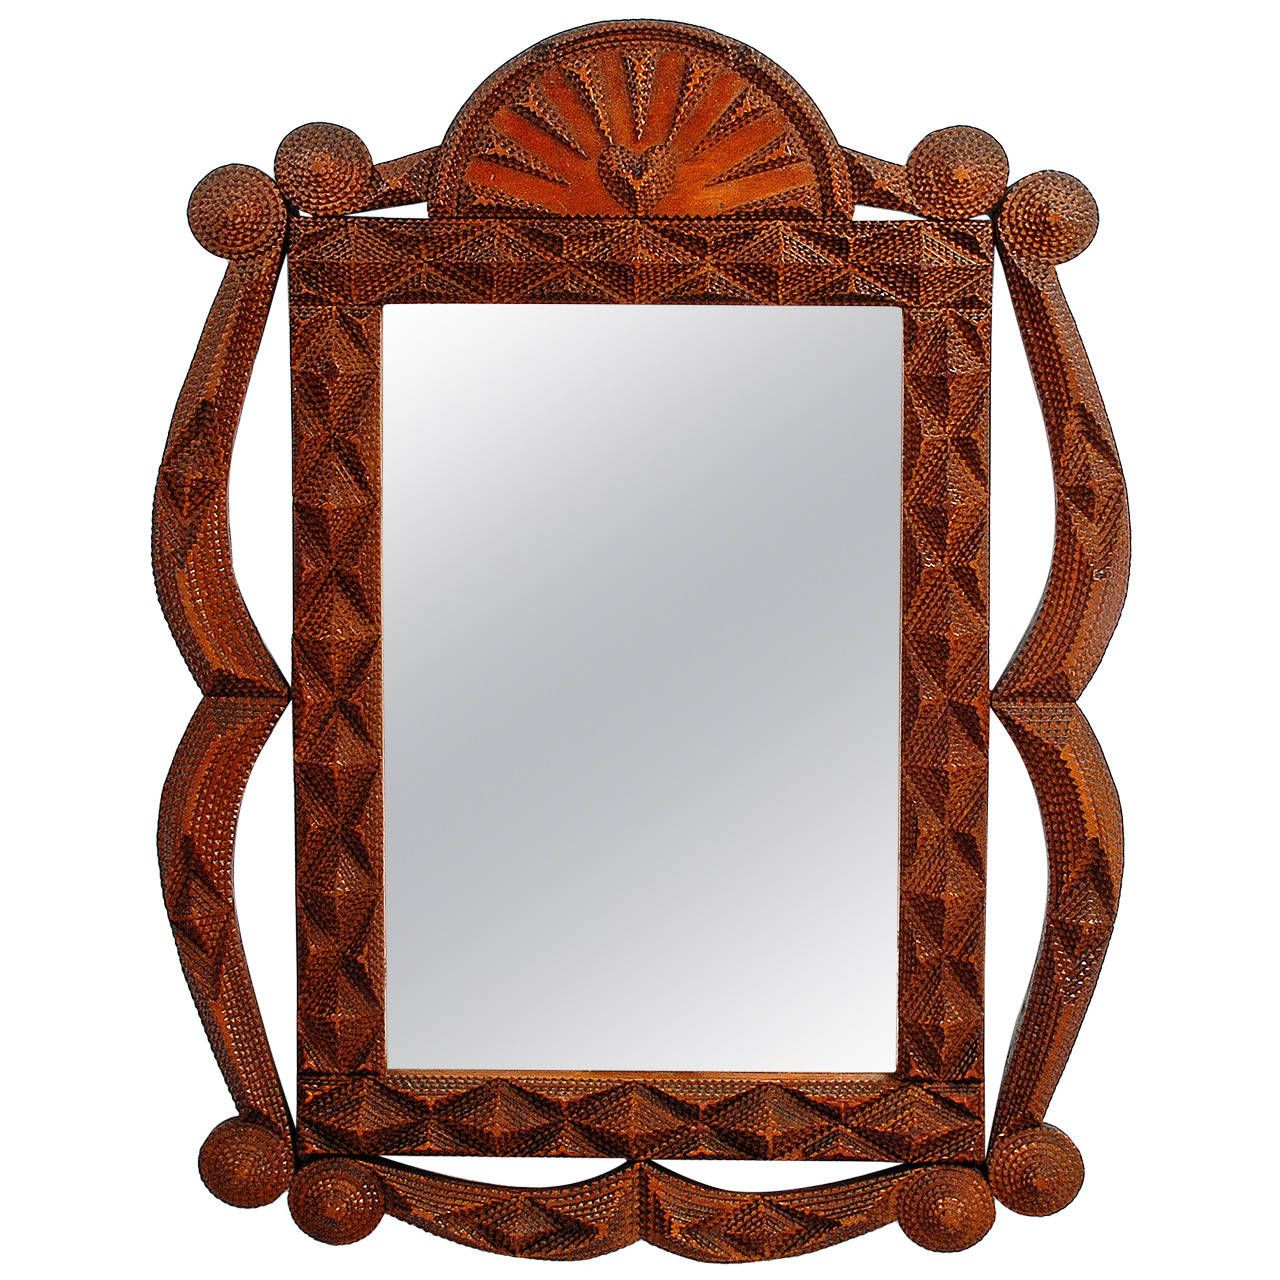 Fluid Tramp Art Mirror with Fan Top   Modern wall mirrors, Modern ...